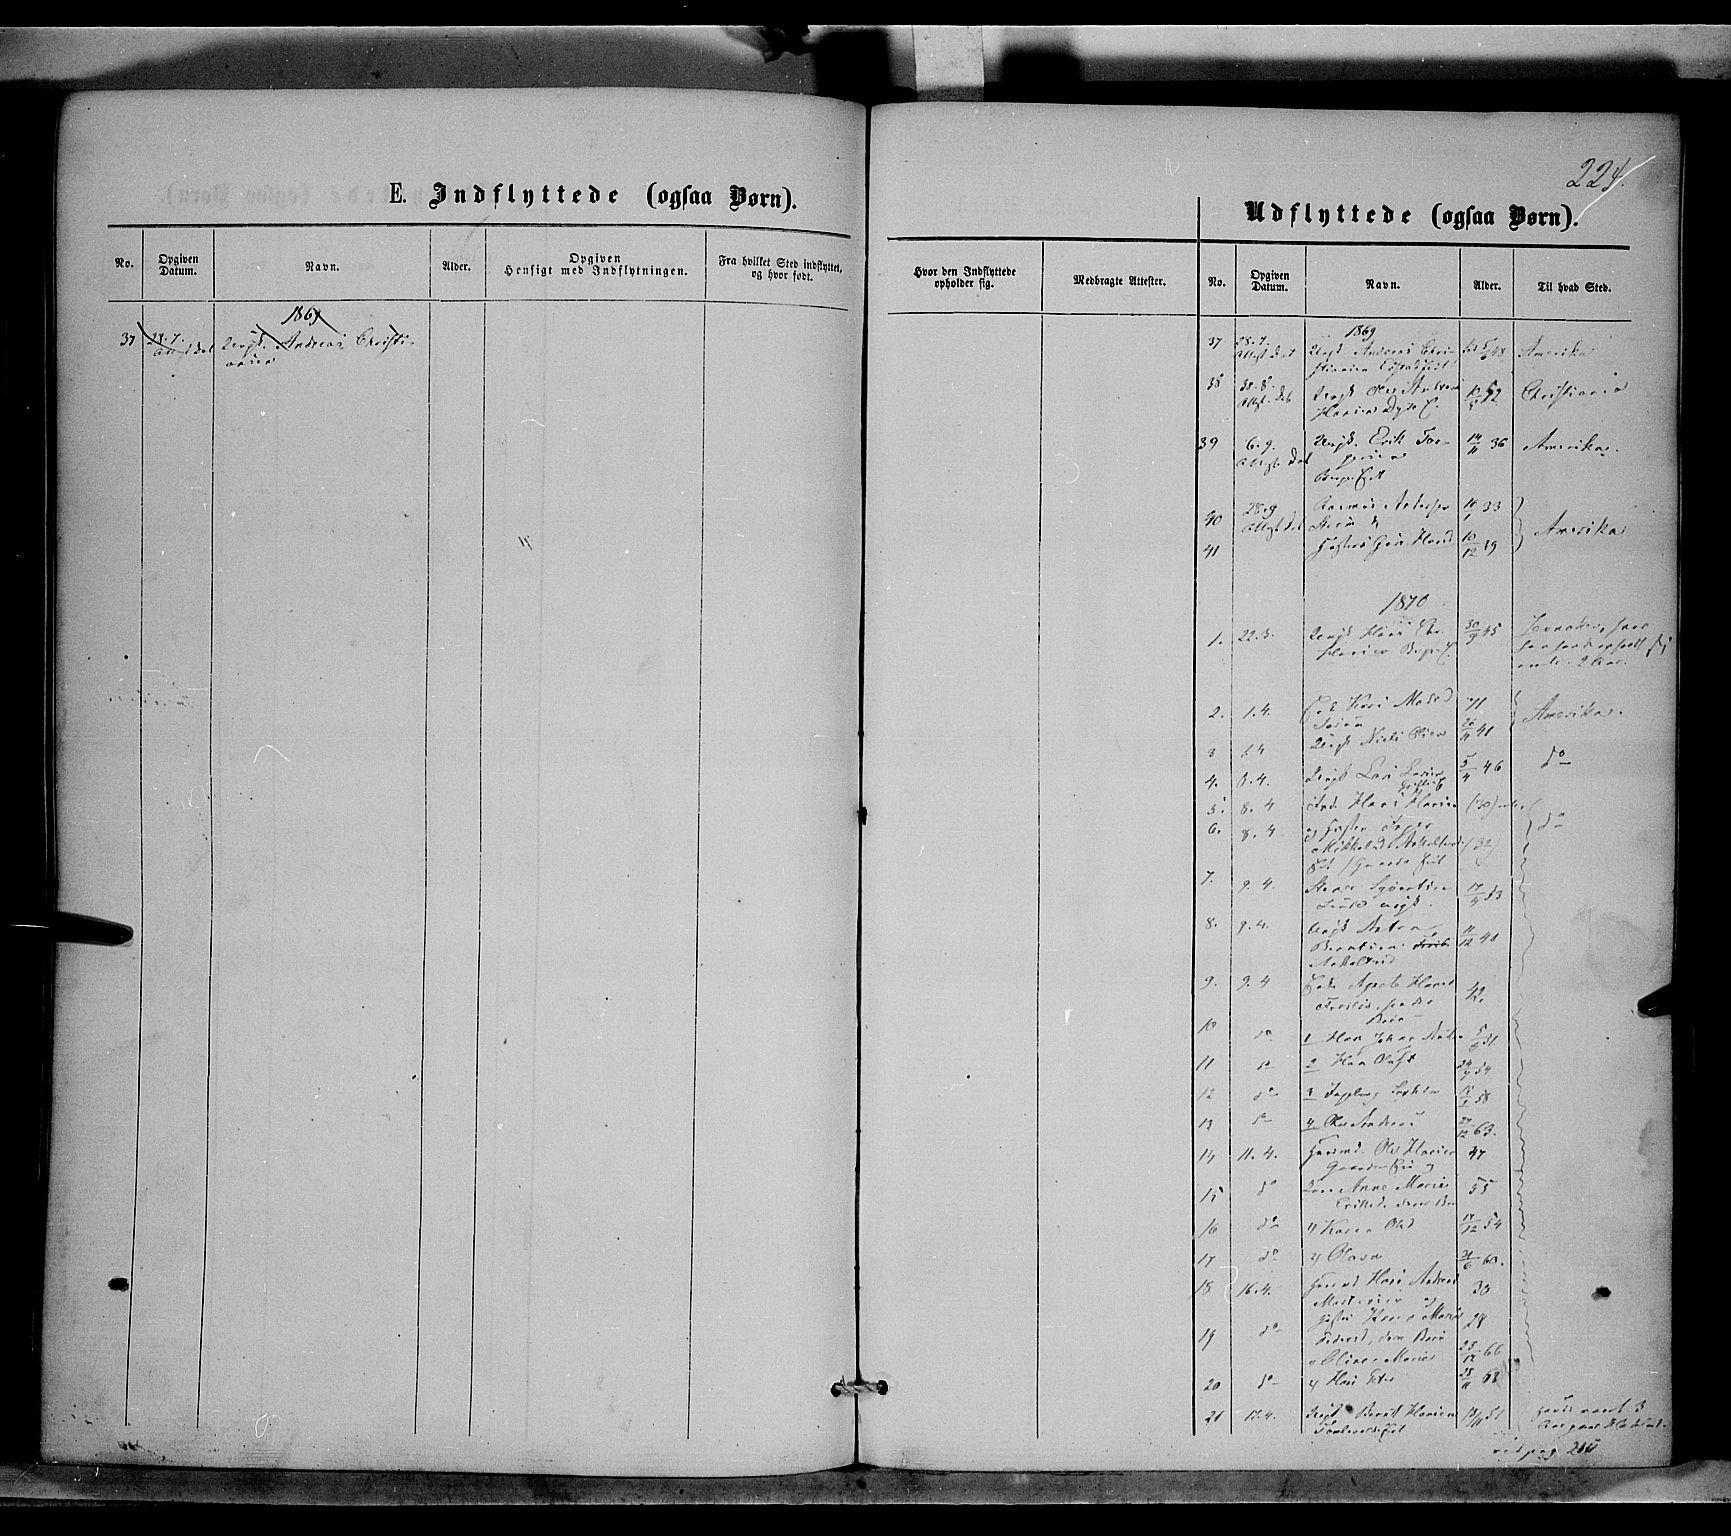 SAH, Nordre Land prestekontor, Ministerialbok nr. 1, 1860-1871, s. 224